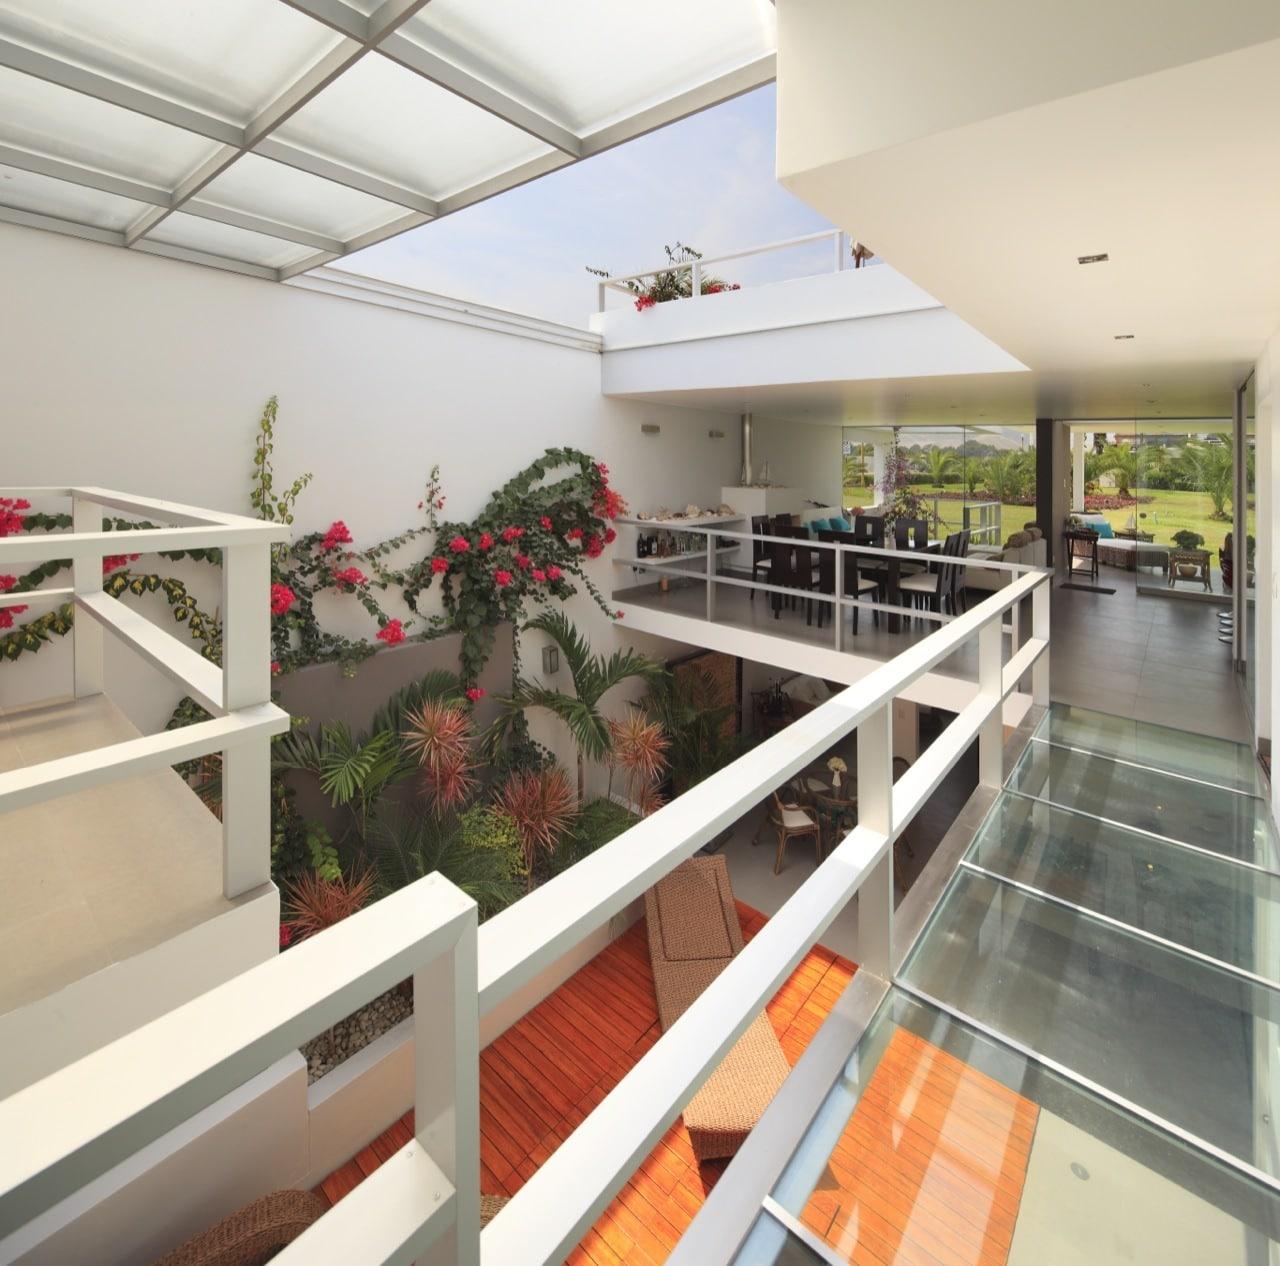 Dise o de casa de una planta con s tano y terraza piscina for Fachada de casas modernas con vidrio